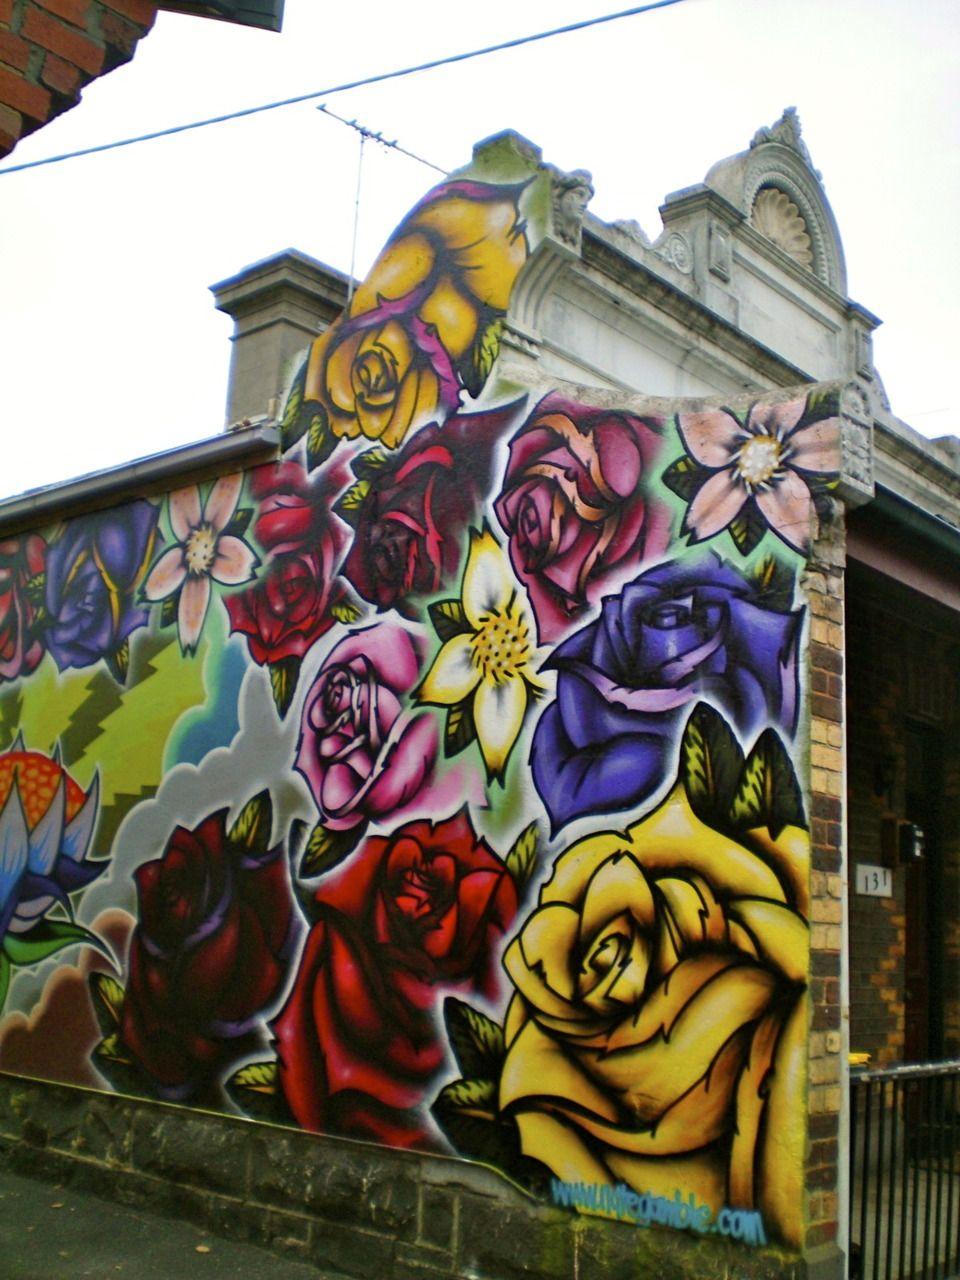 Colorful Love Graffiti Images